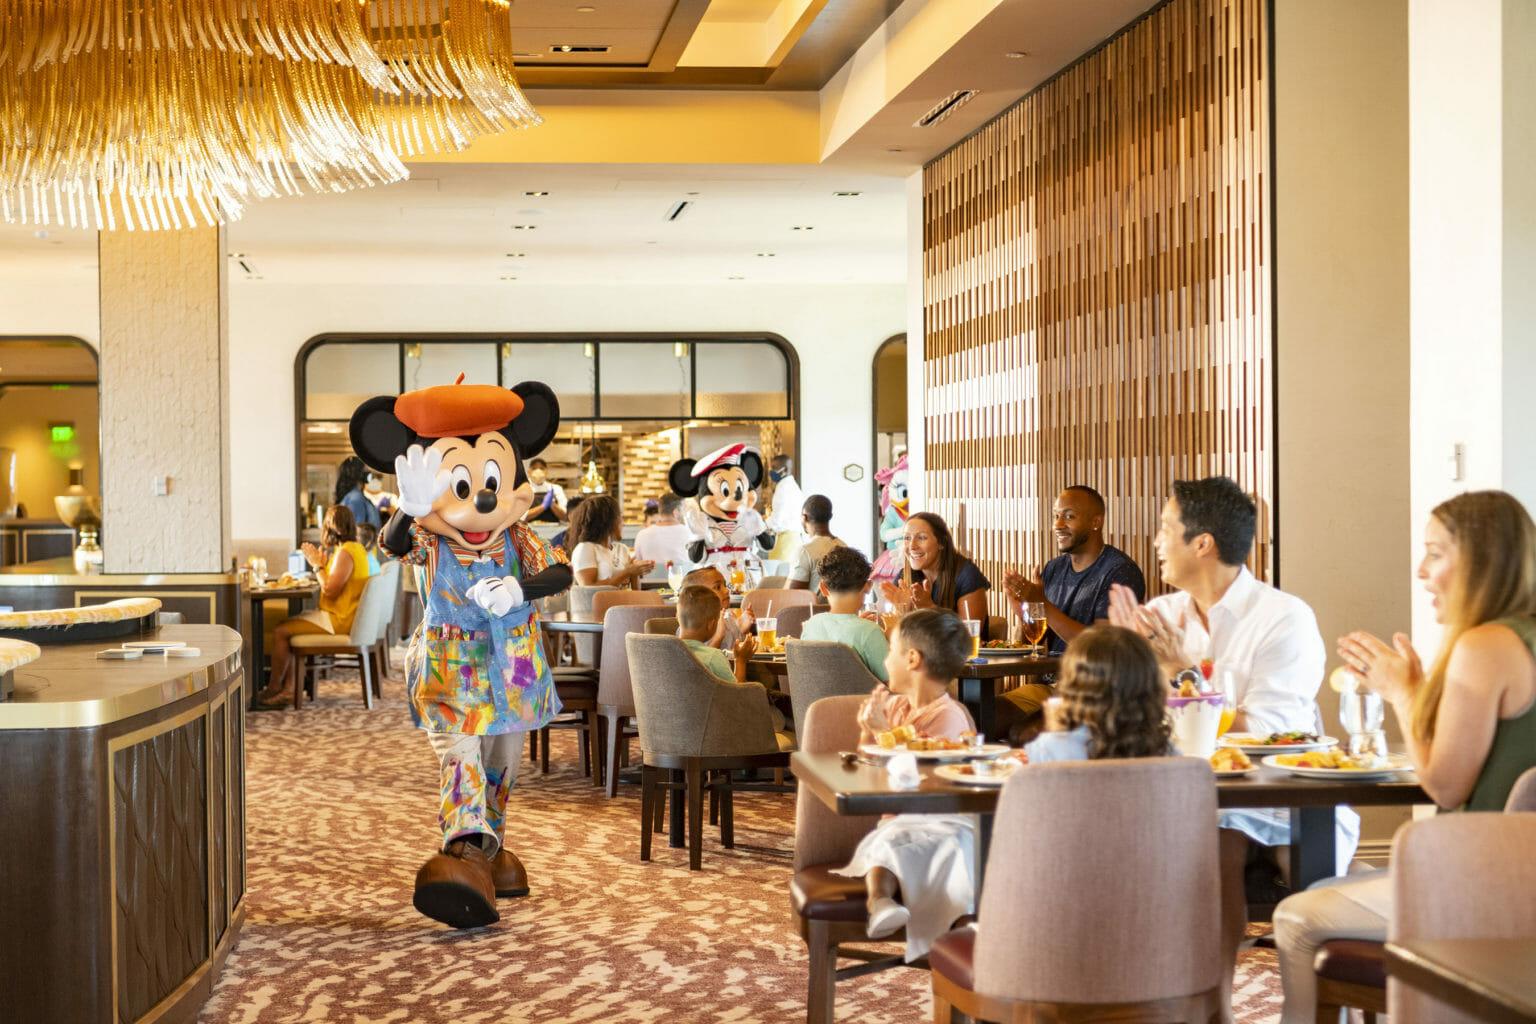 Walt Disney World Character Dining